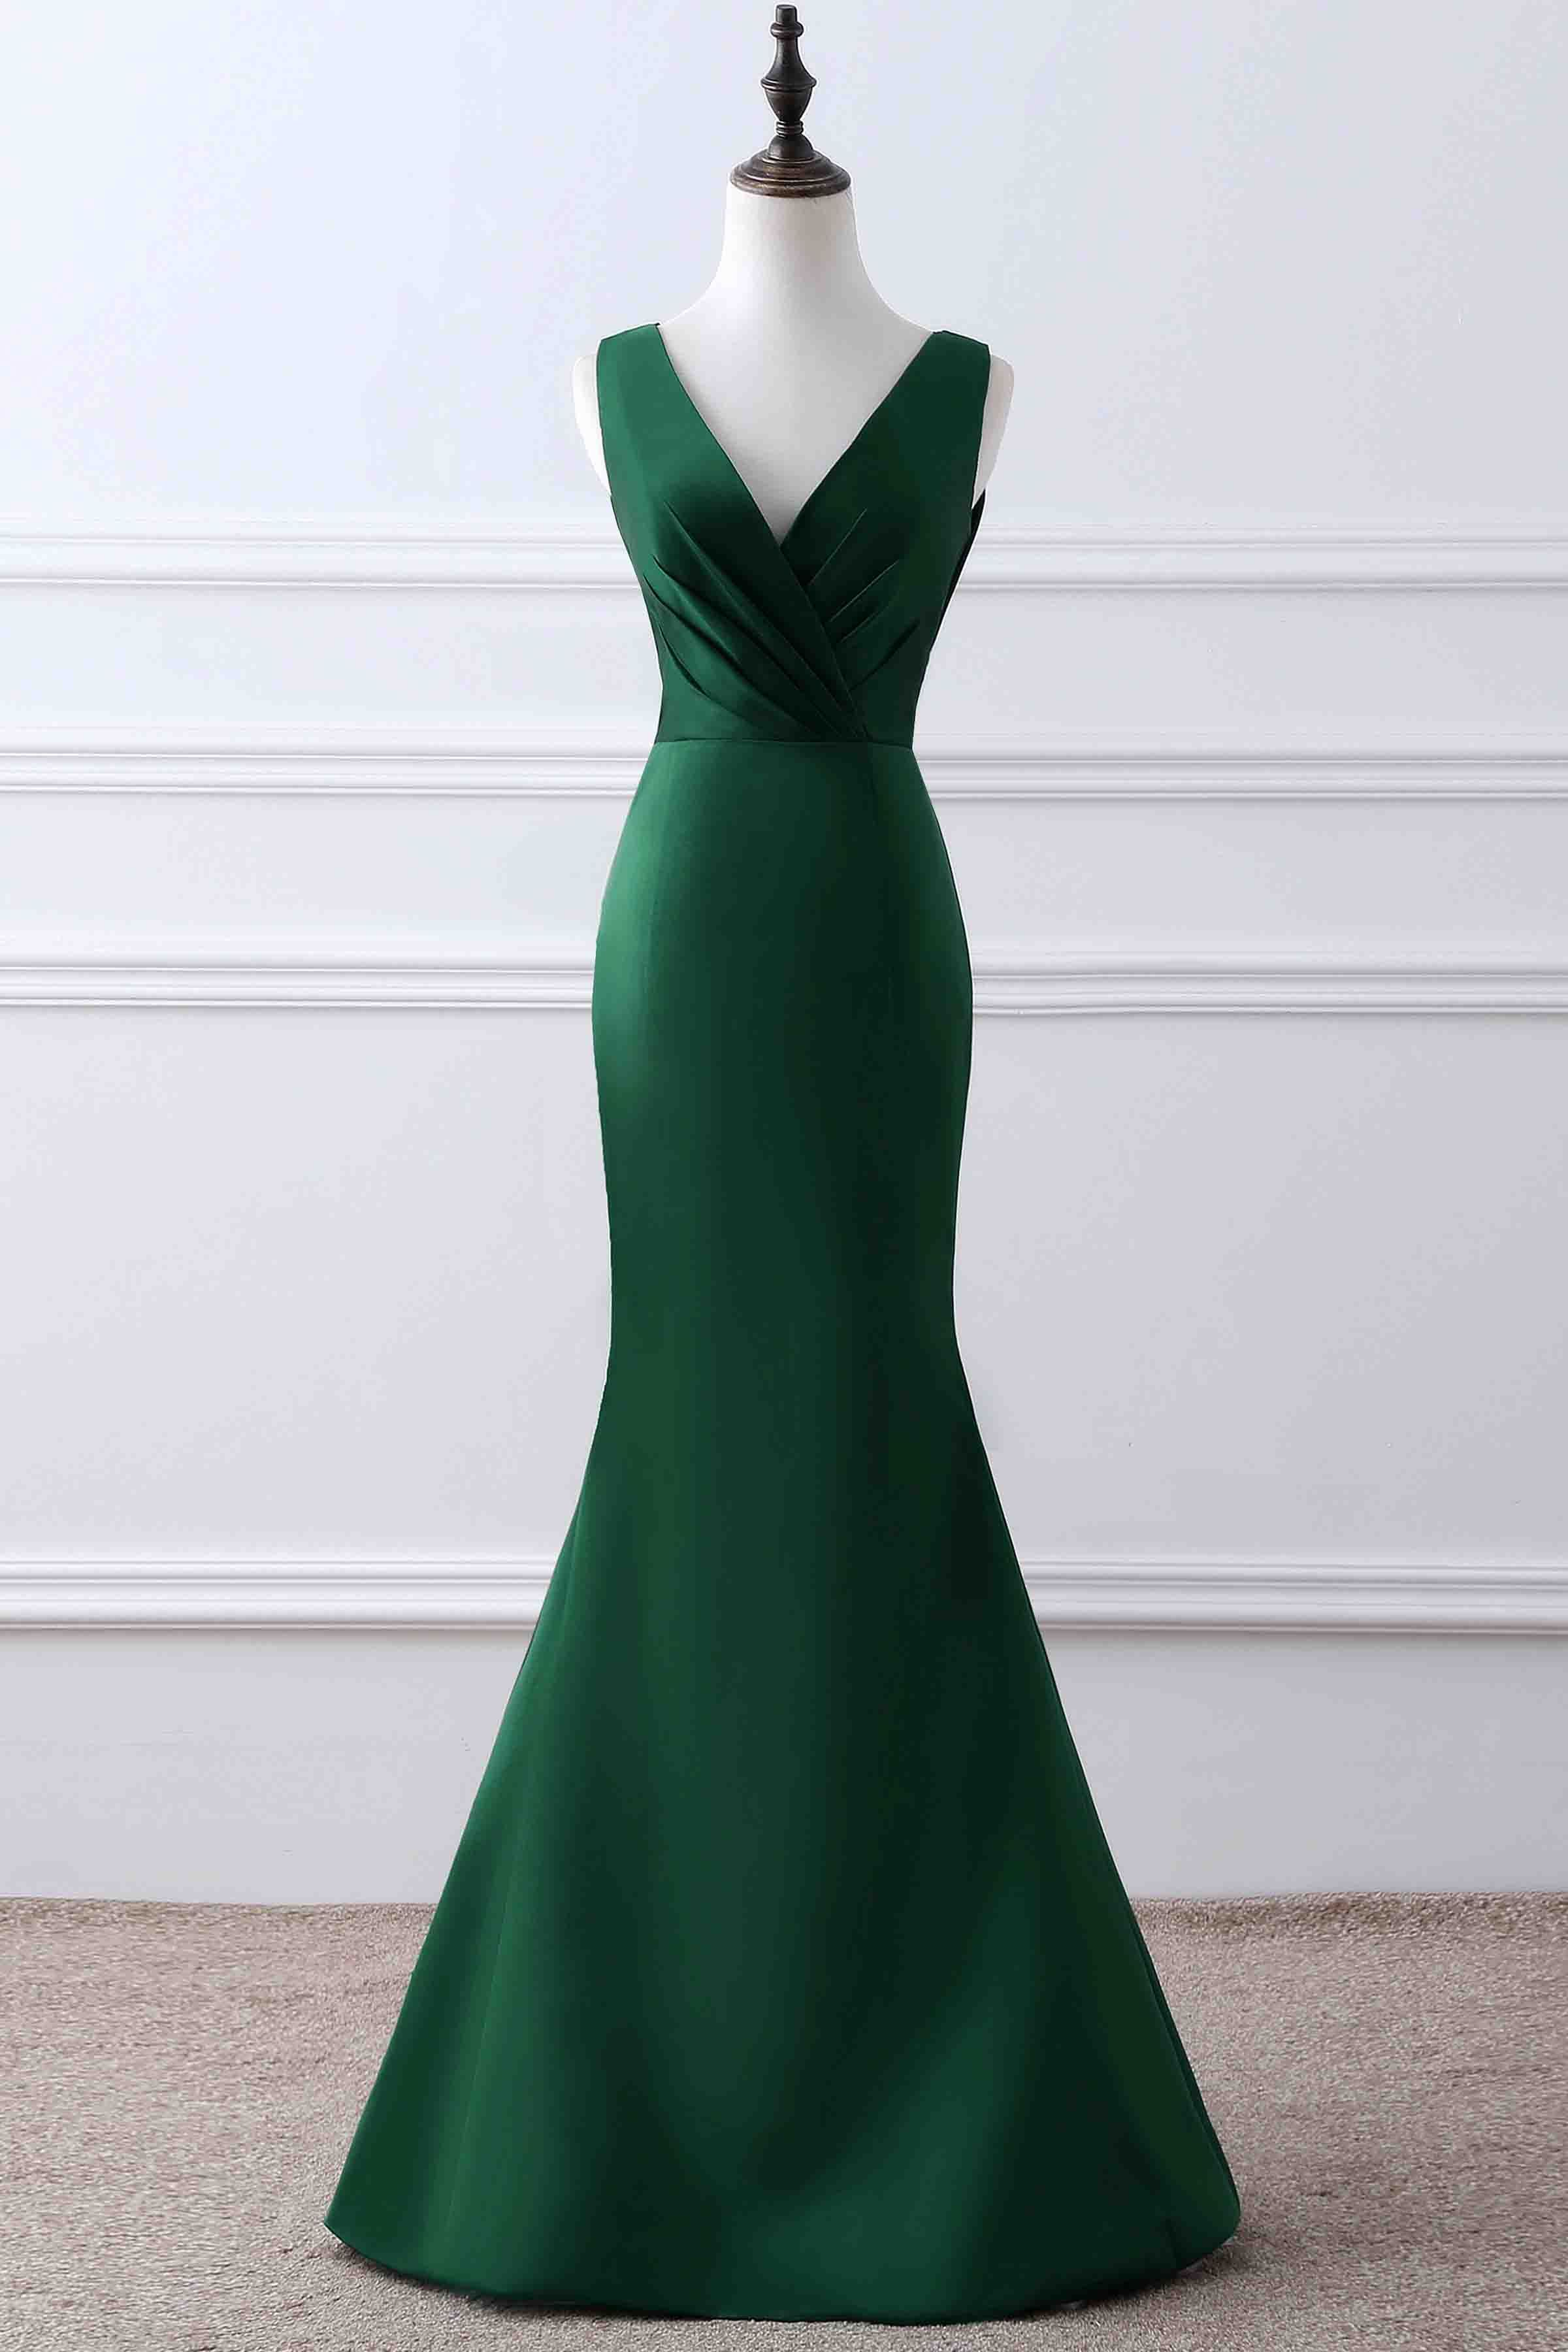 Emerald green prom dress  Simple green matte satin prom dress ball gown elegant vneck long